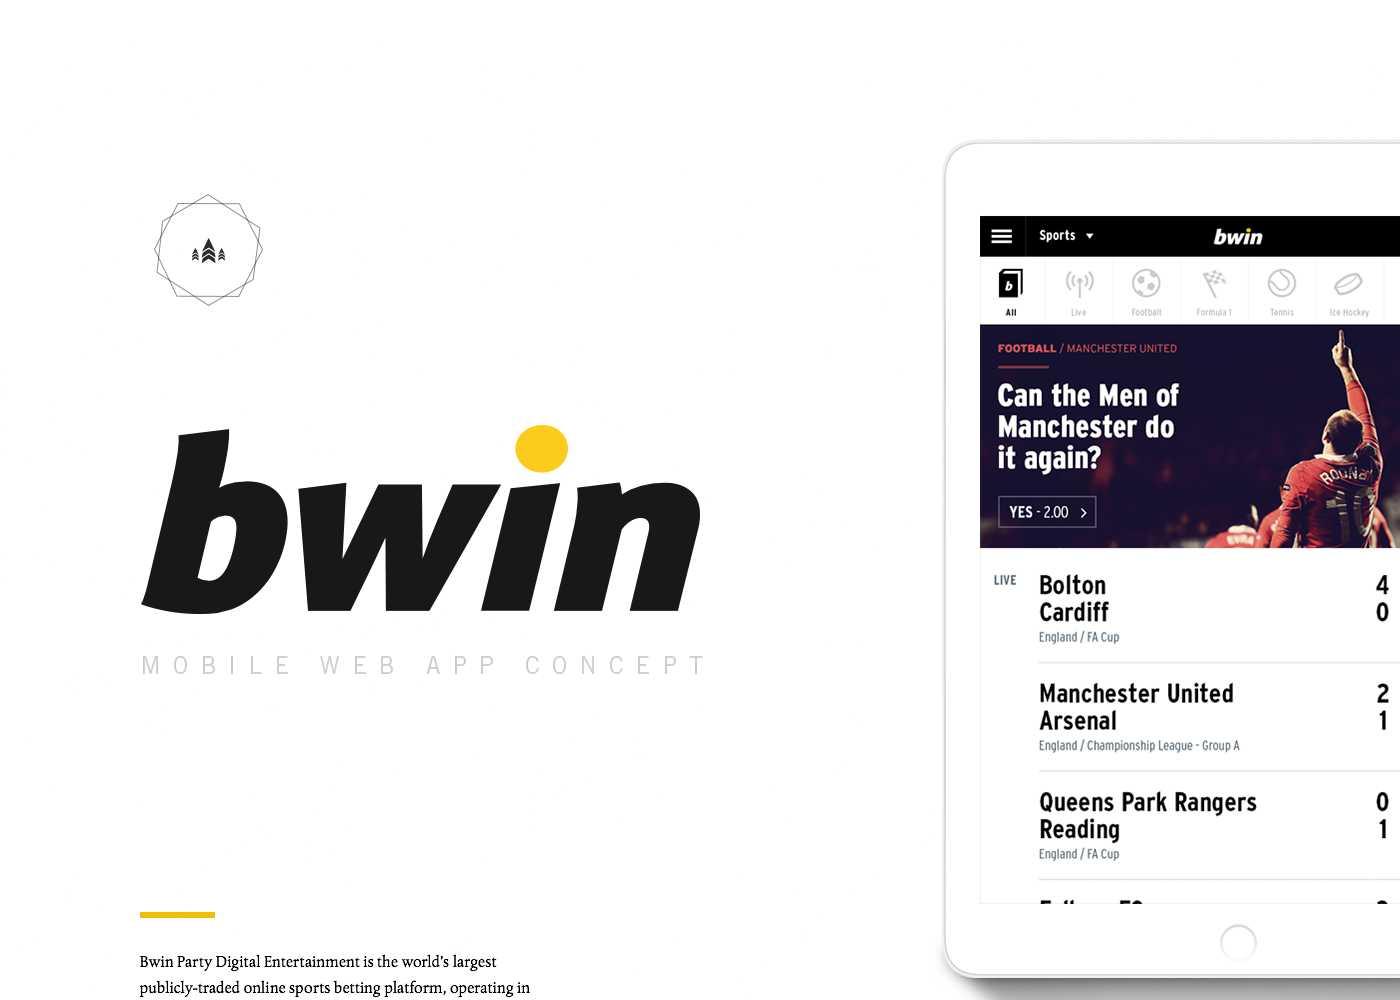 BWIN Application